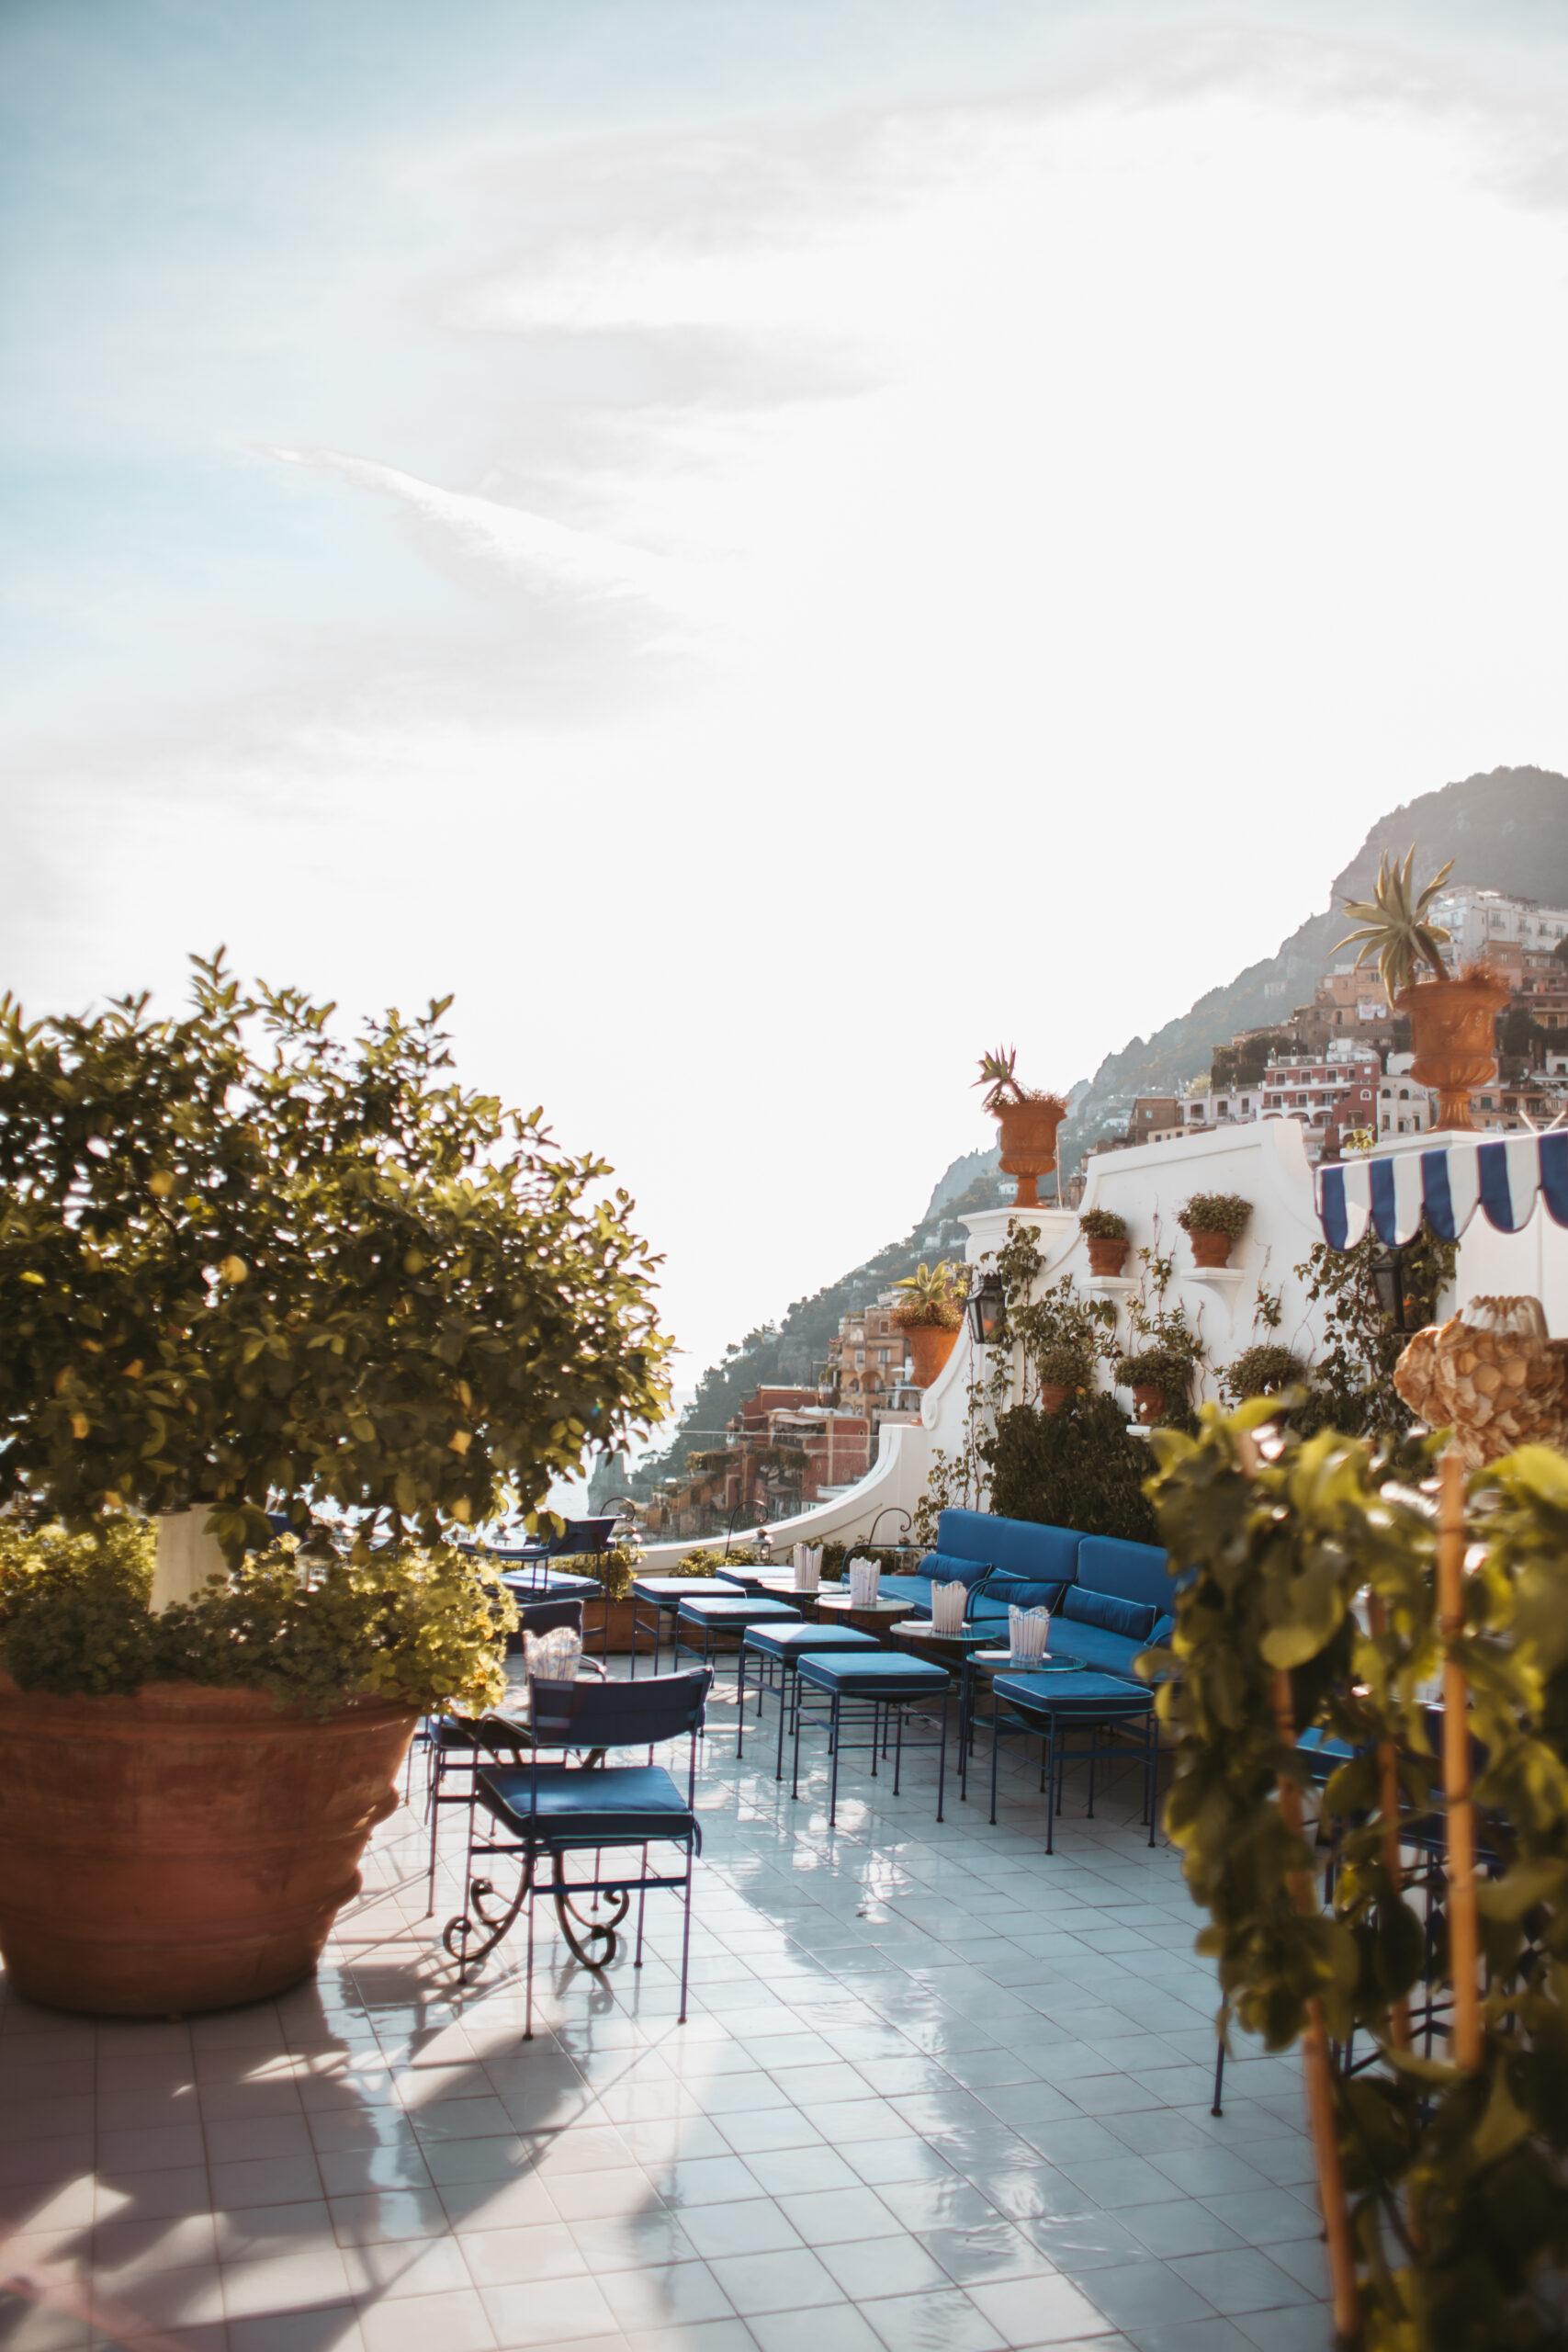 Franco's bar Positano, restaurant Positano, Amalfi coast, Italy, positano gdzie zjesc